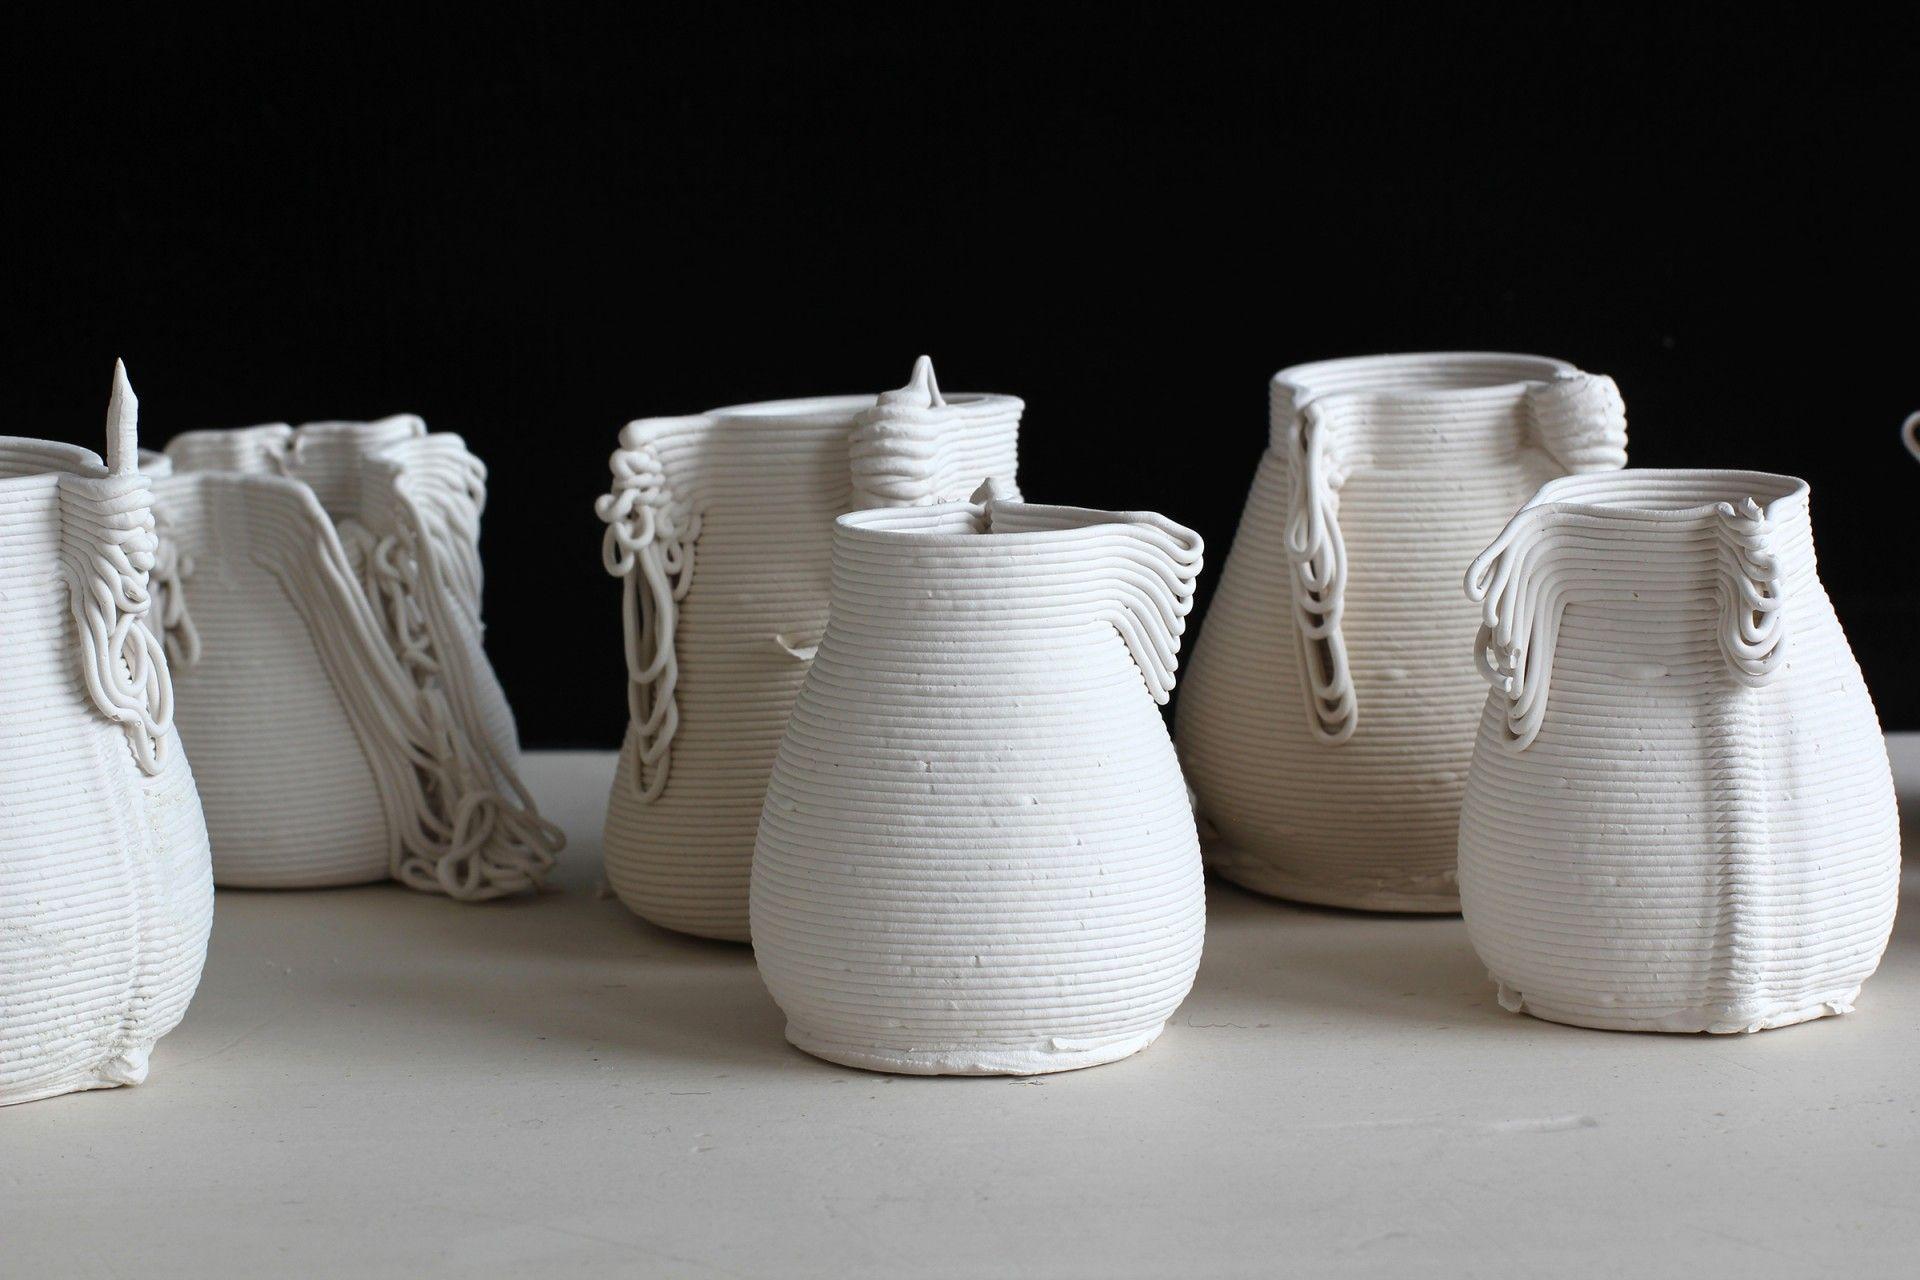 3D printed ceramics Alterfact #73 Lucile Sciallano • Victorian Craft Award